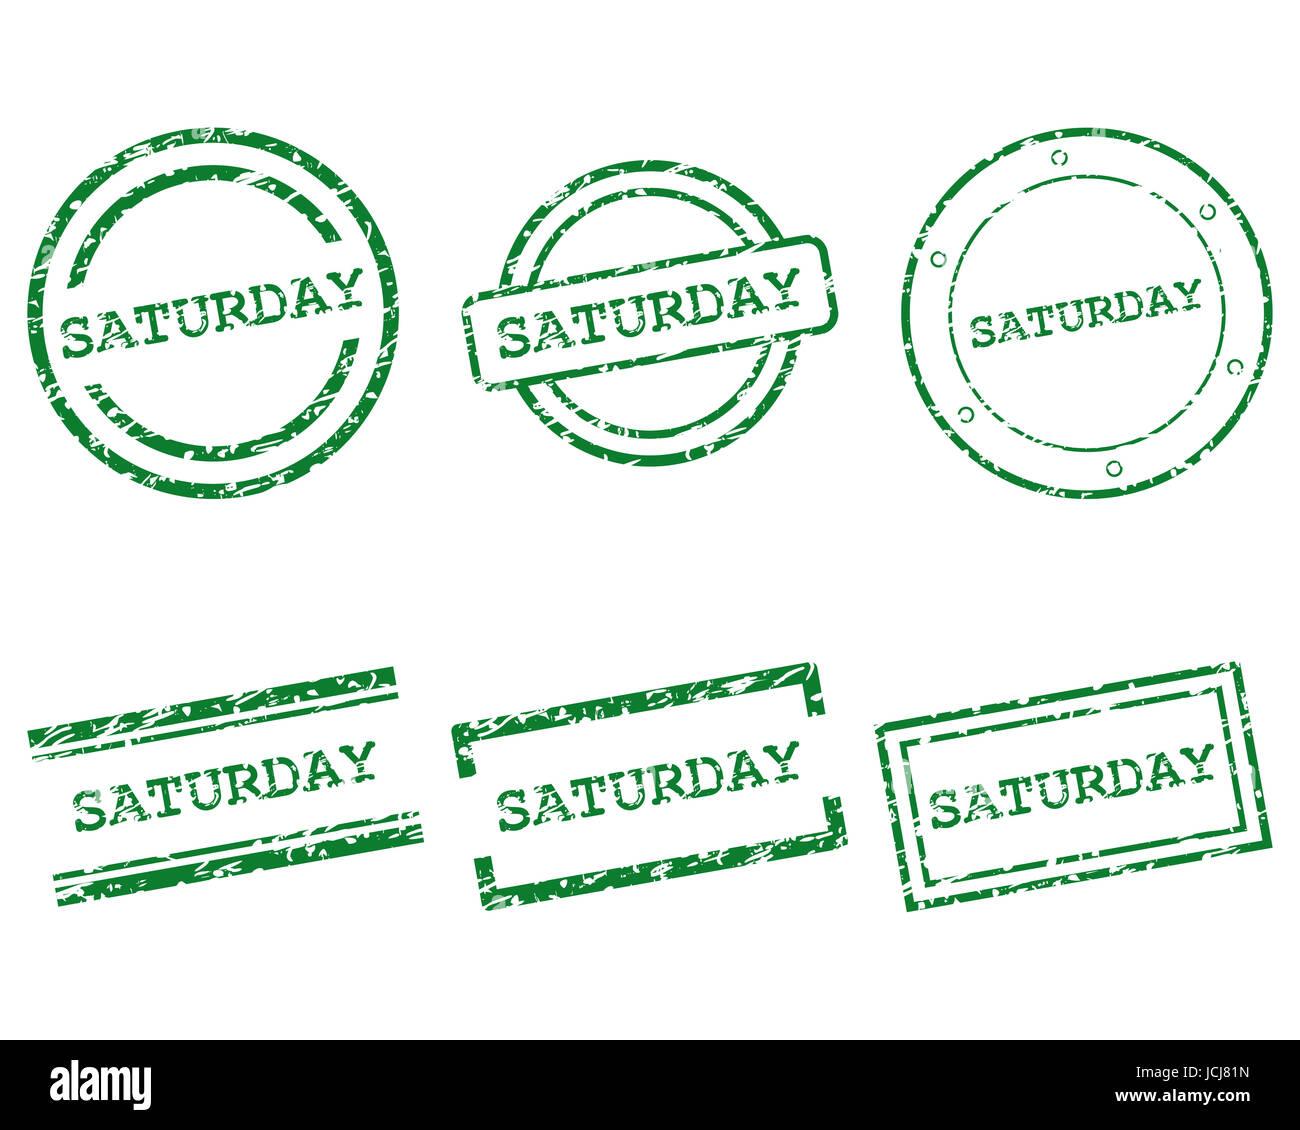 Saturday Stempel - Stock Image